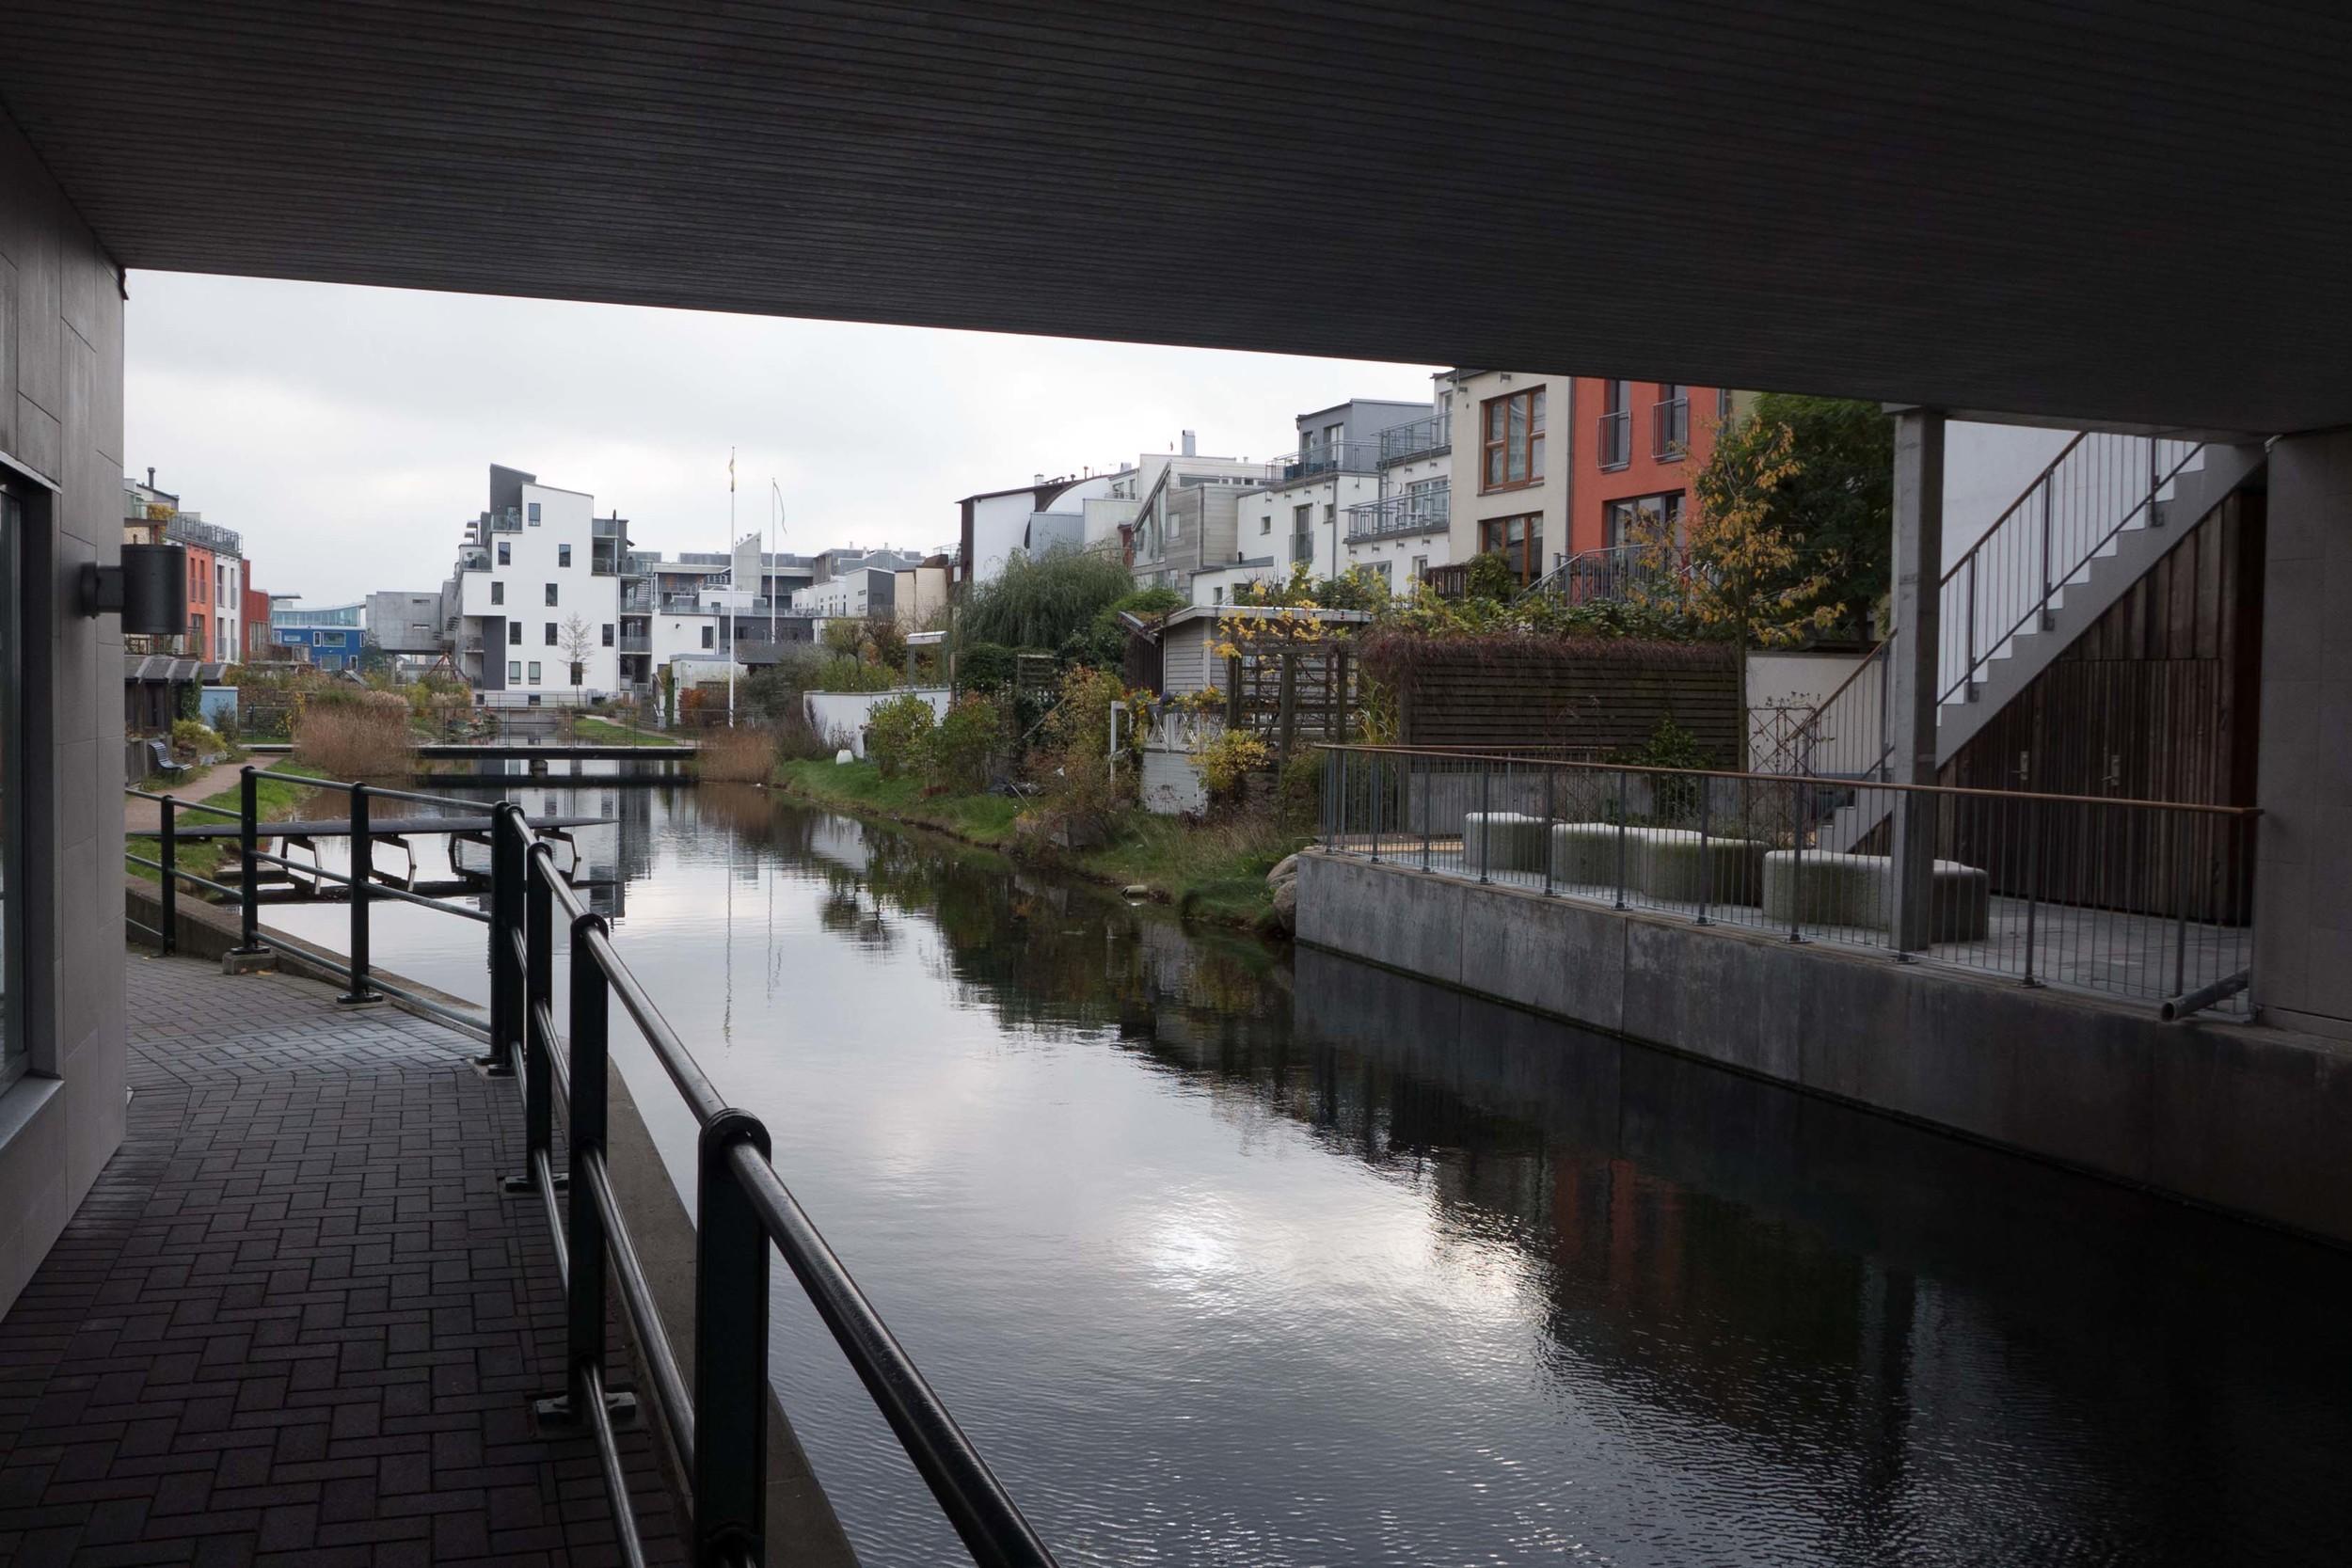 Malmo the canal.jpg